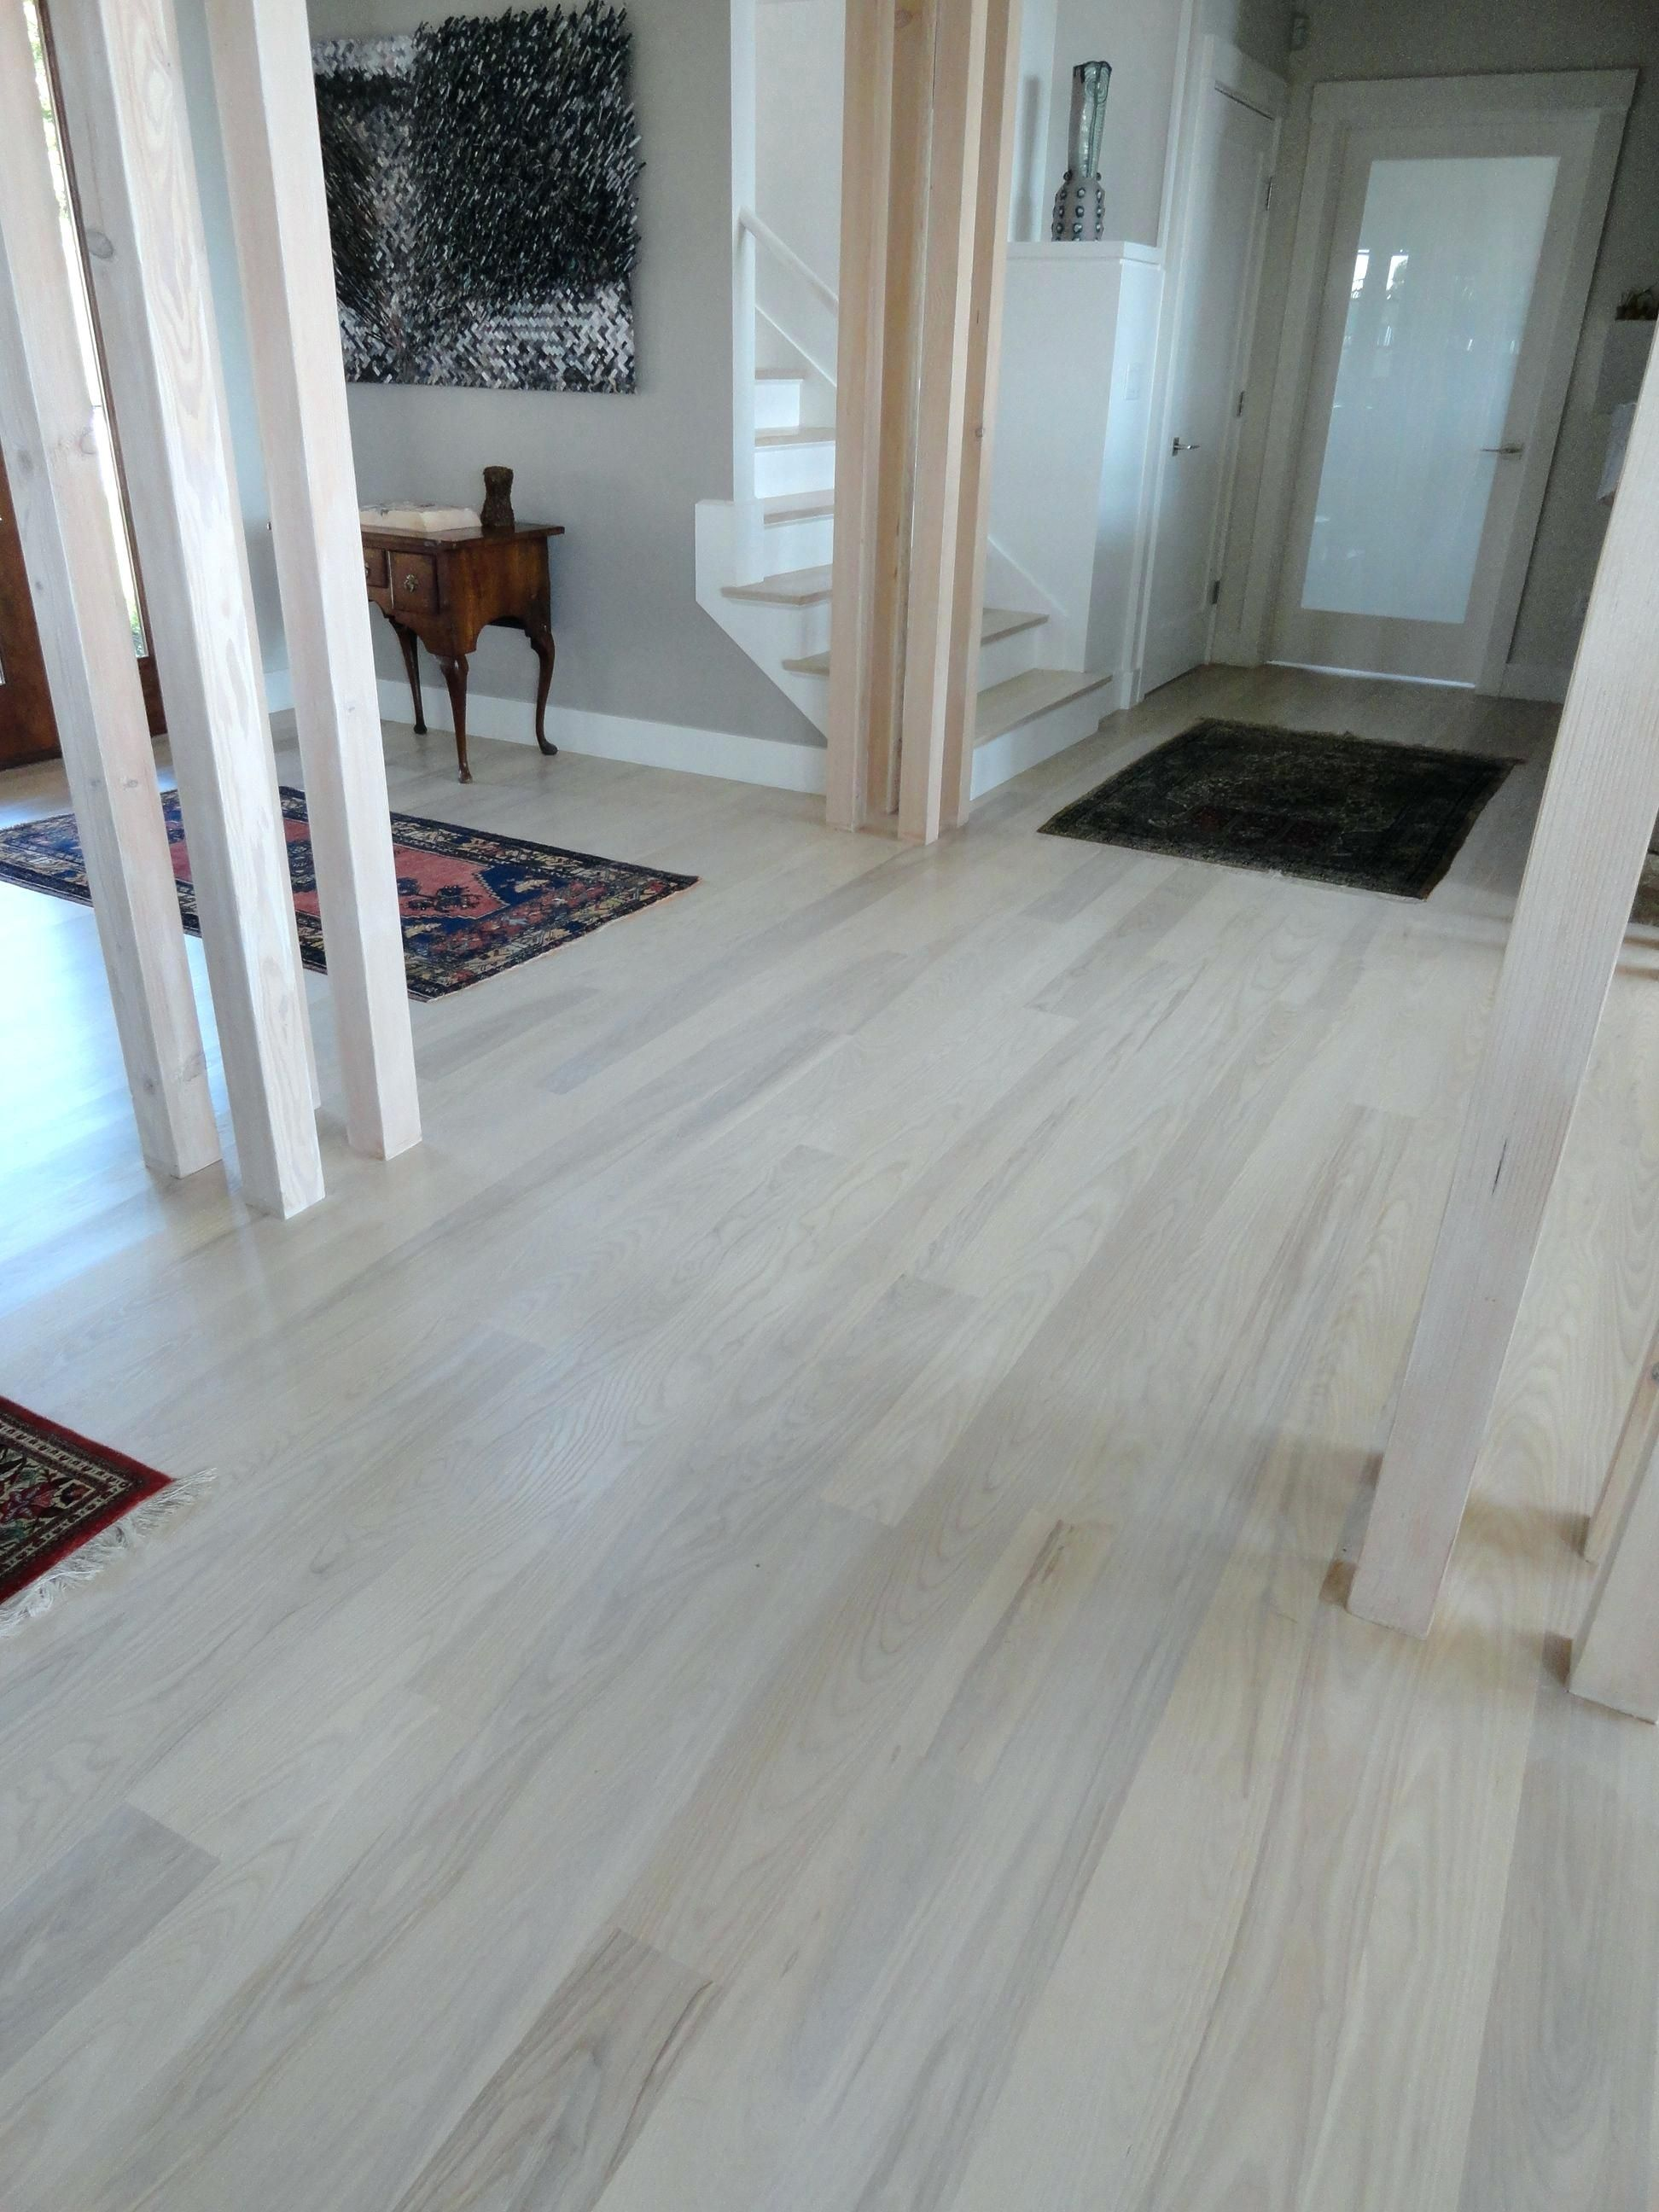 Bleach Laminate Wood Floors With